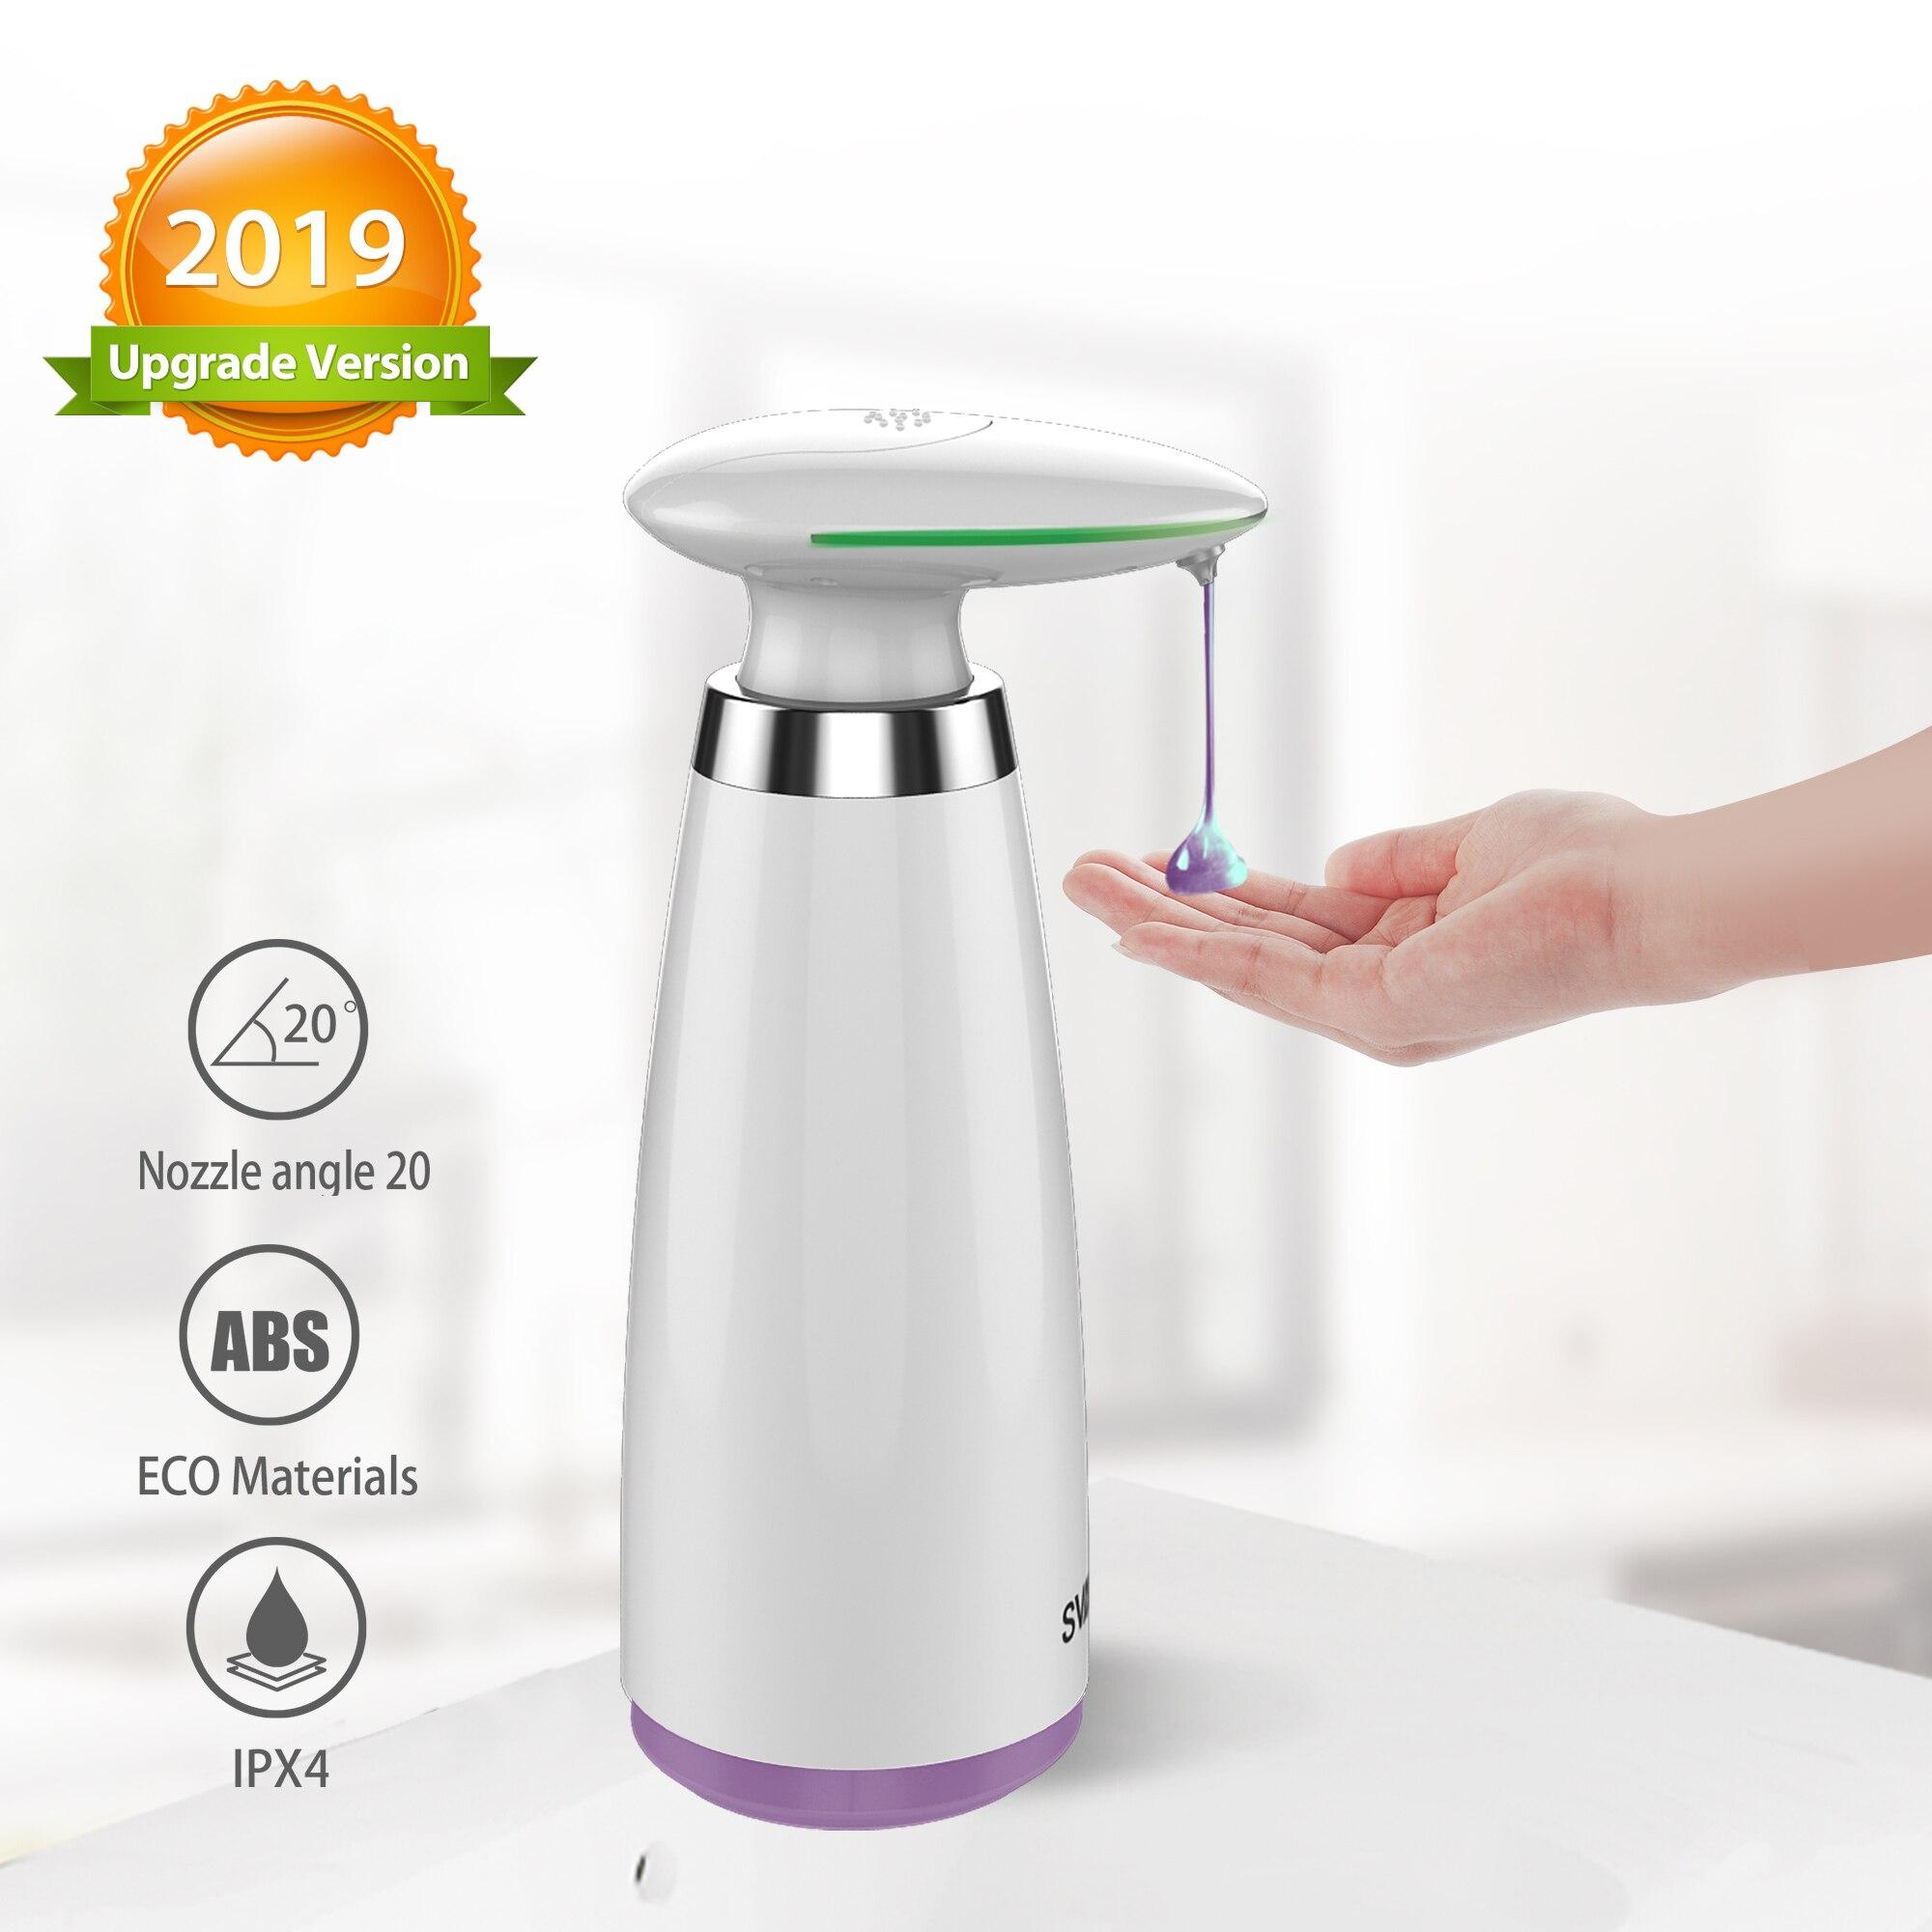 350ml Automatic Soap Dispenser Hand Free Touchless Sanitizer Bathroom Dispenser Smart Sensor Liquid Soap Dispenser For Kitchen